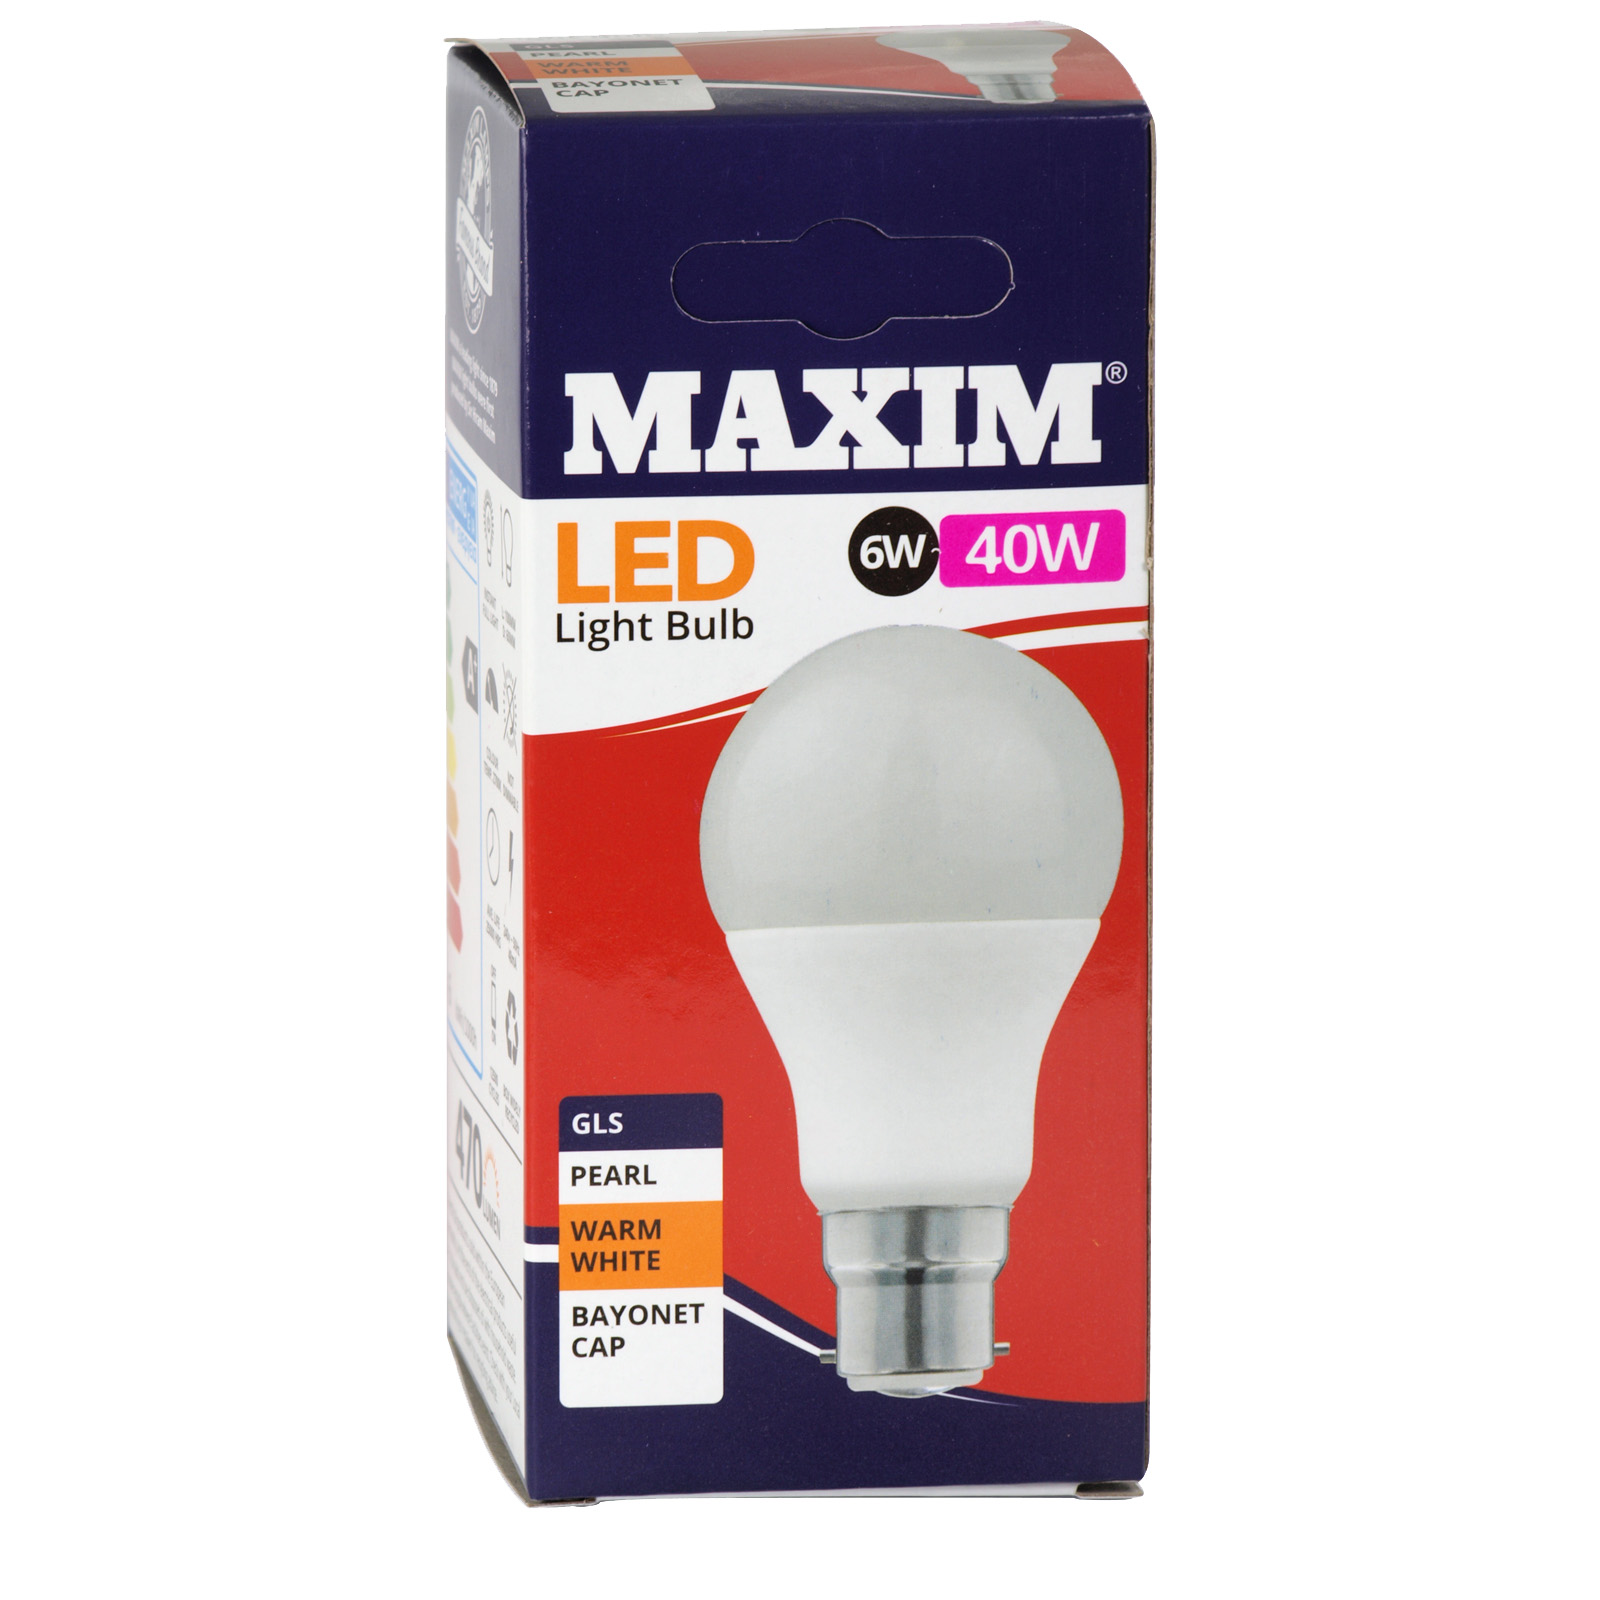 STATUS LED WARM WHITE PEARL LIGHT BULB GLS BC 6W=40W 470 LUMEN X10